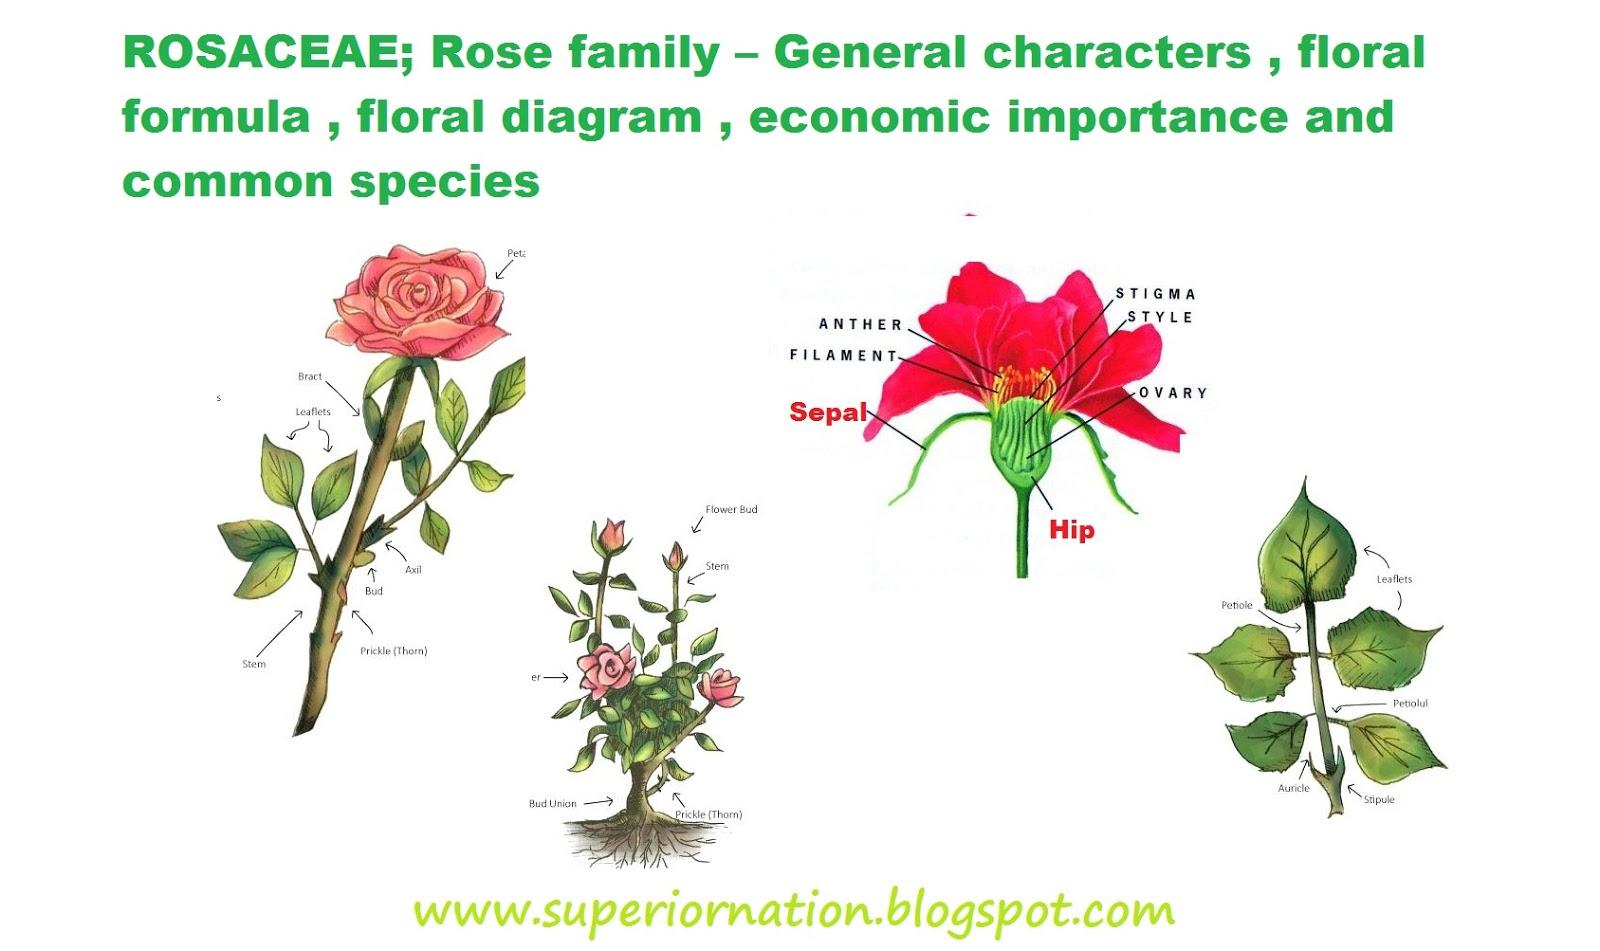 medium resolution of rosaceae rose family general characters floral formula floral rose flower floral diagram rosaceae